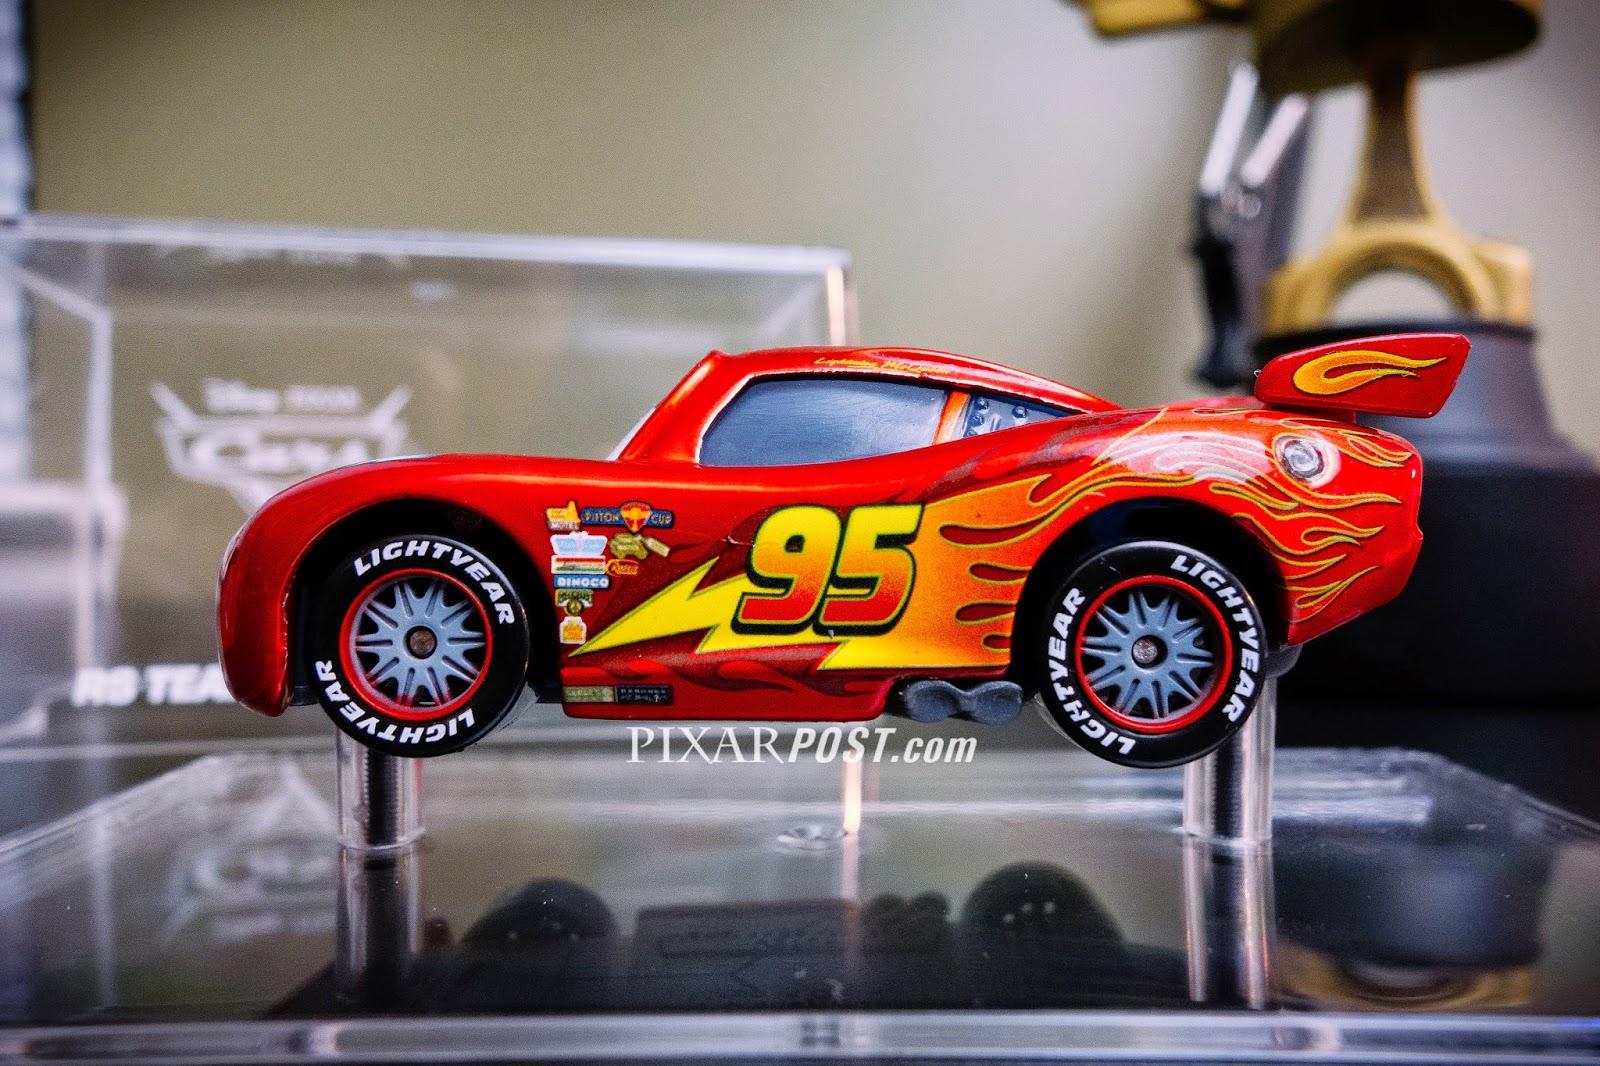 Rs Team Lightning Mcqueen Special Edition Die Cast Car